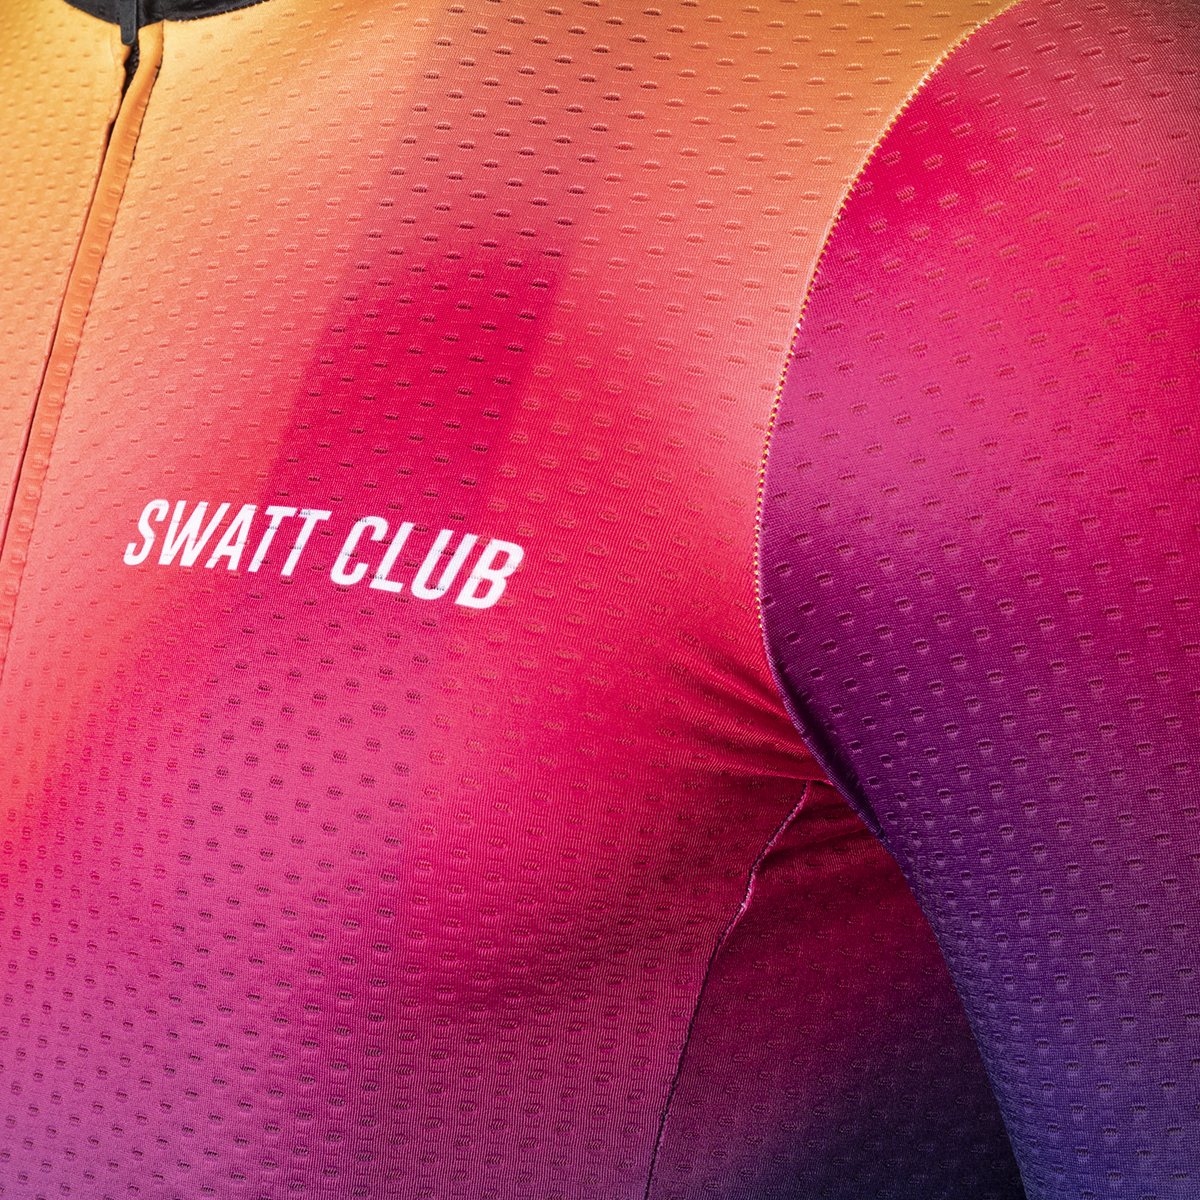 Solero Aero Long Sleeve jersey cycling swatt club